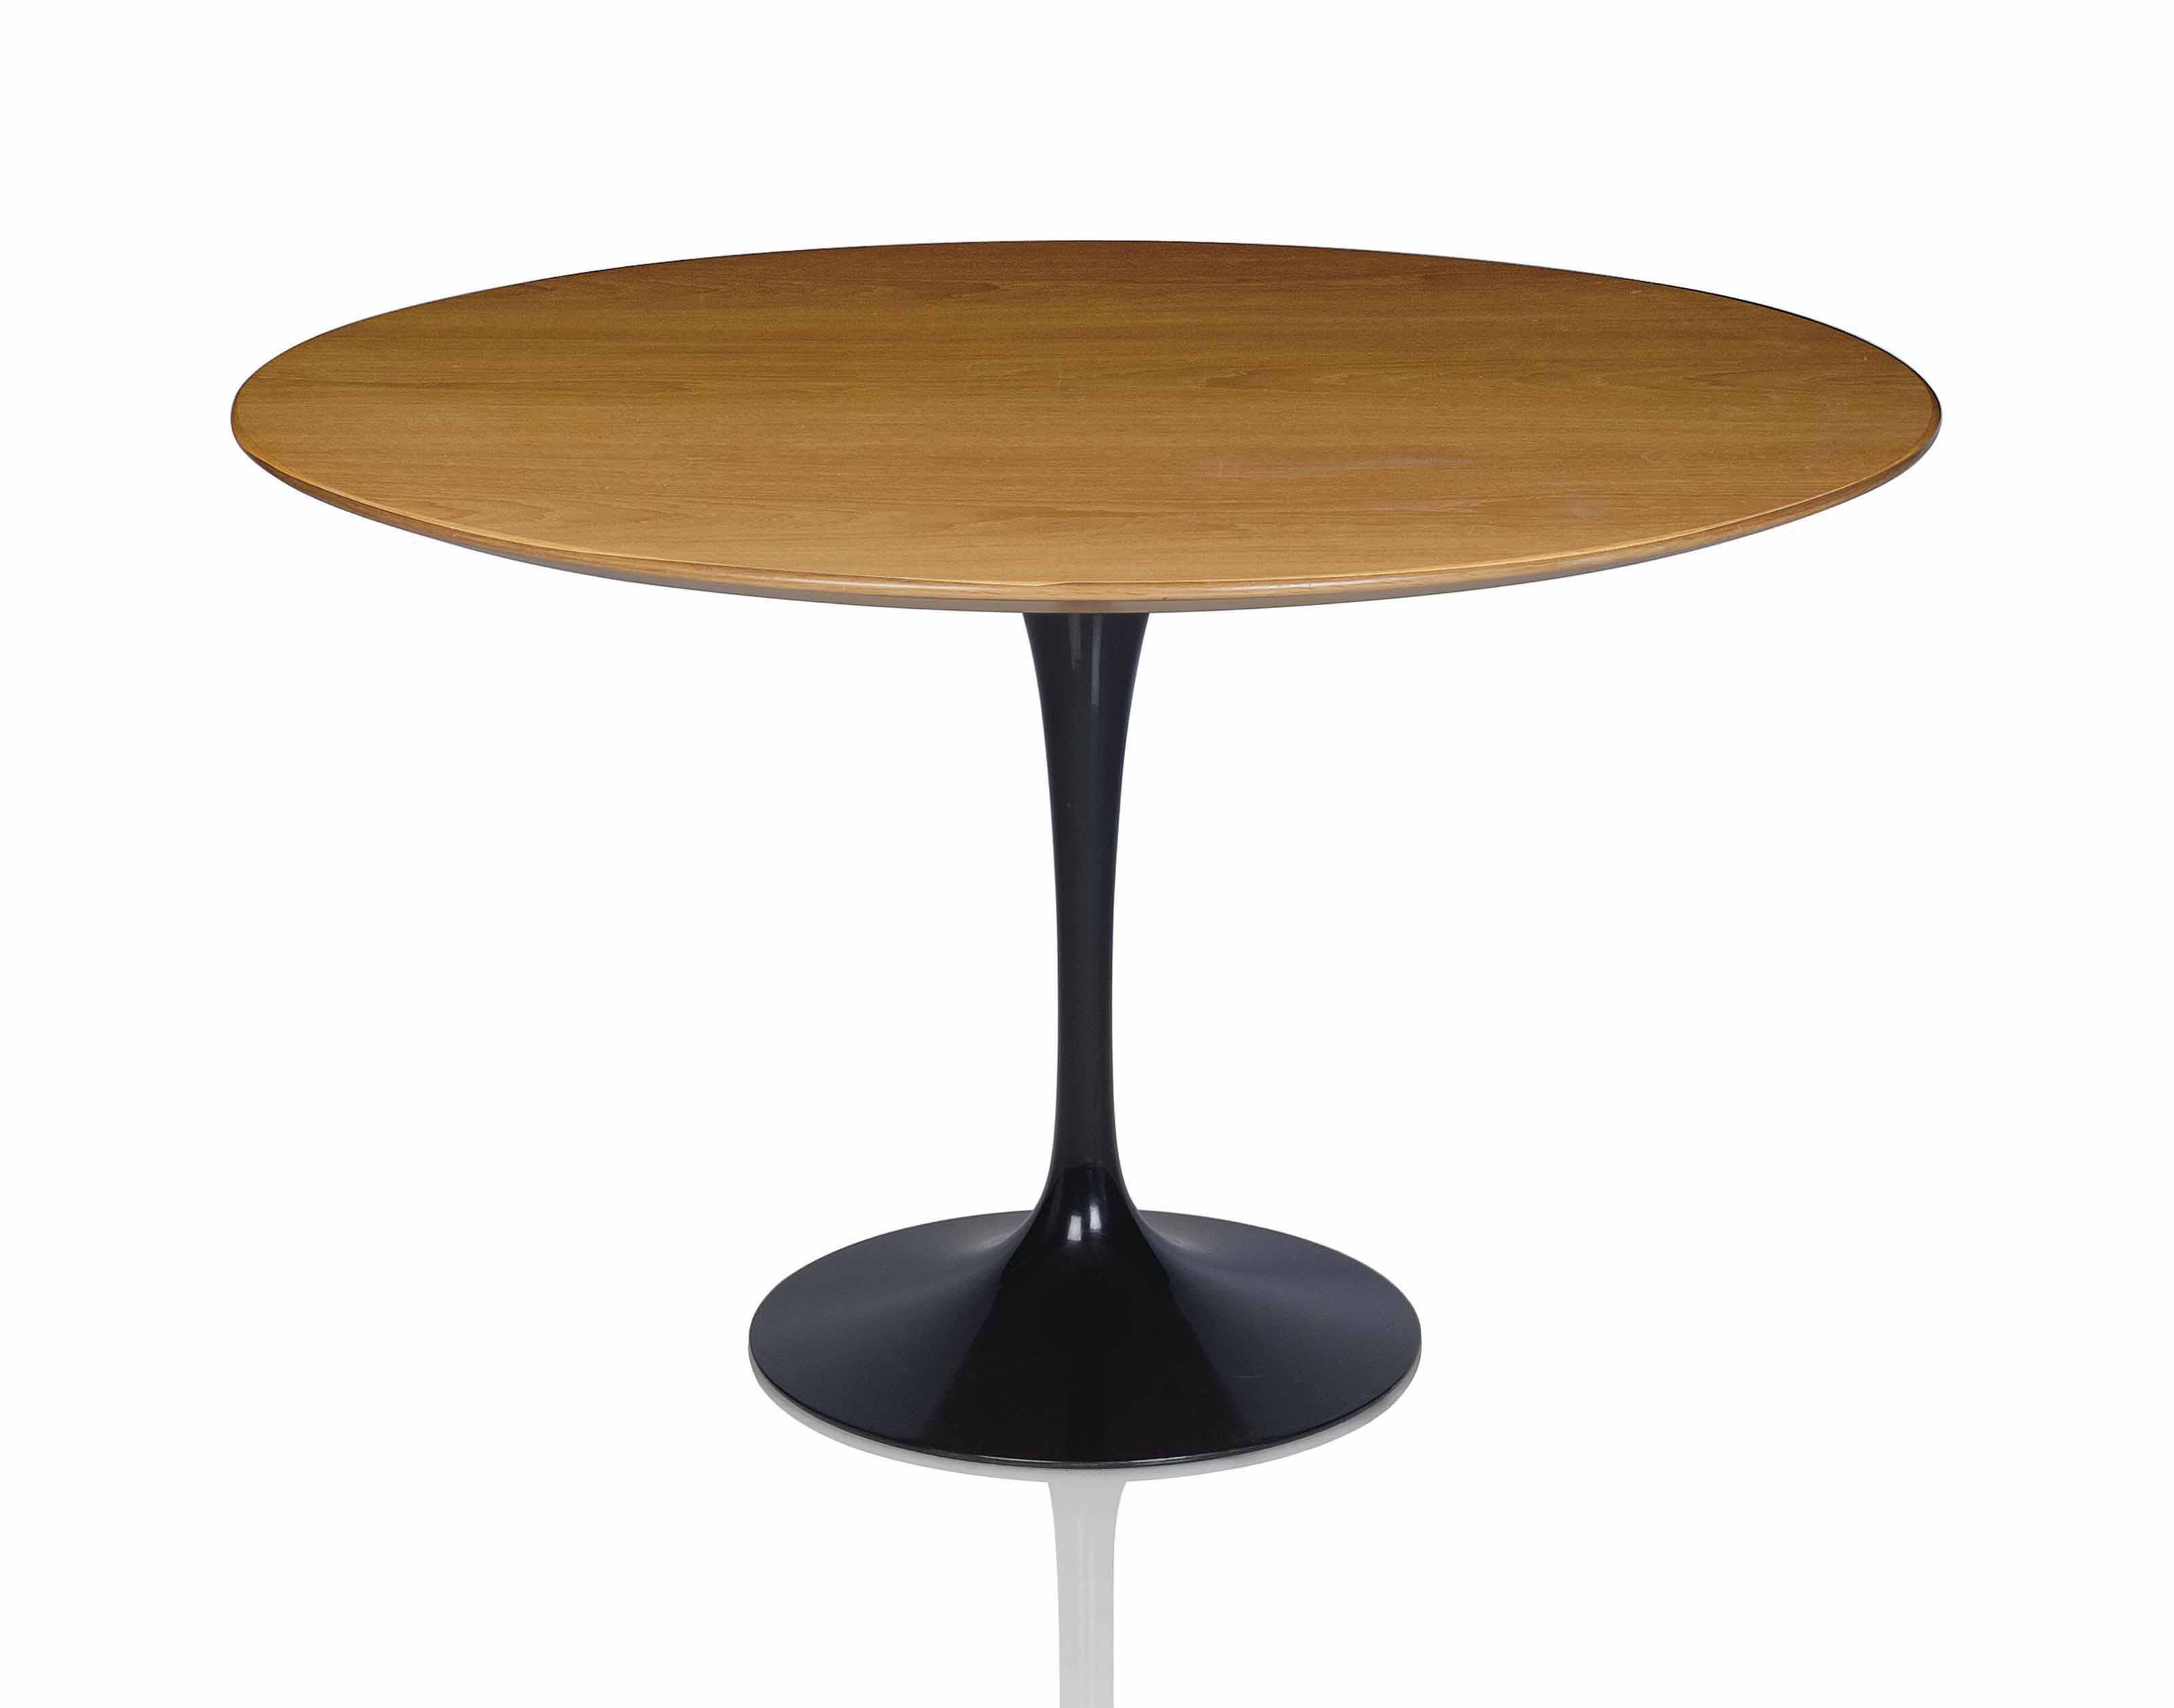 A 'TULIP' TABLE